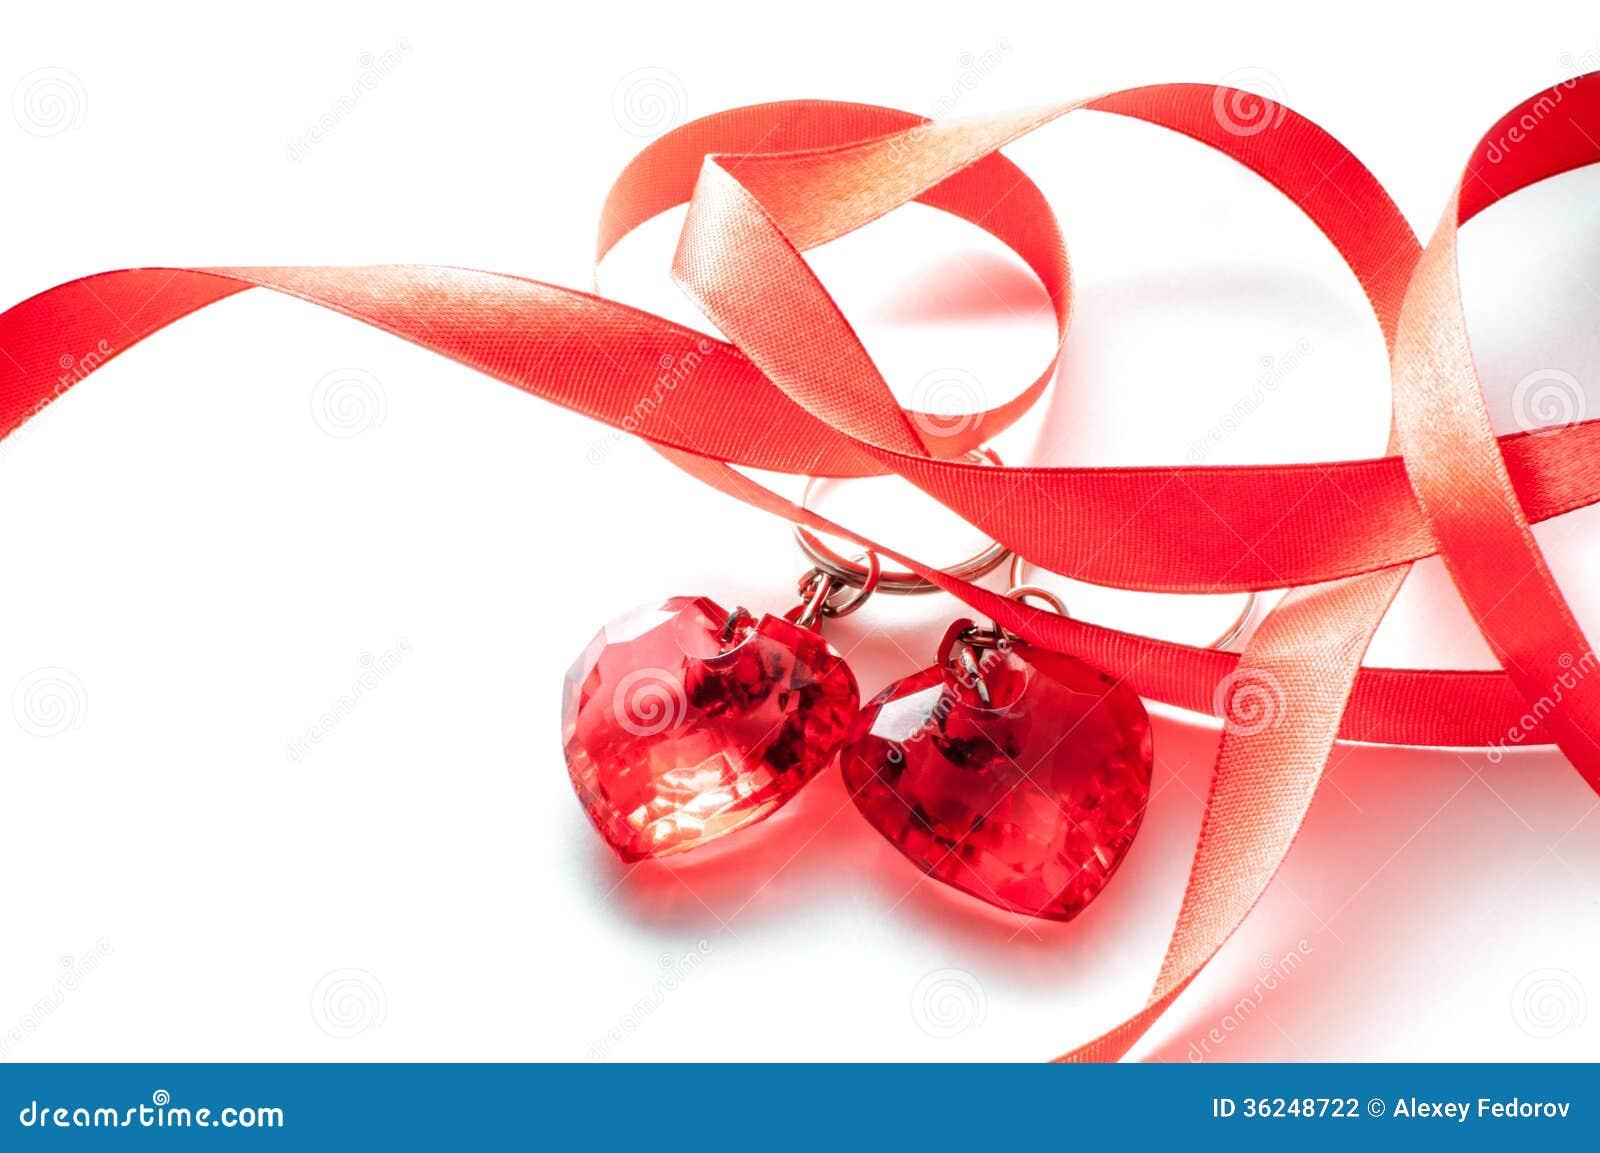 Happy St. Valentine Day Stock Photography - Image: 36248722